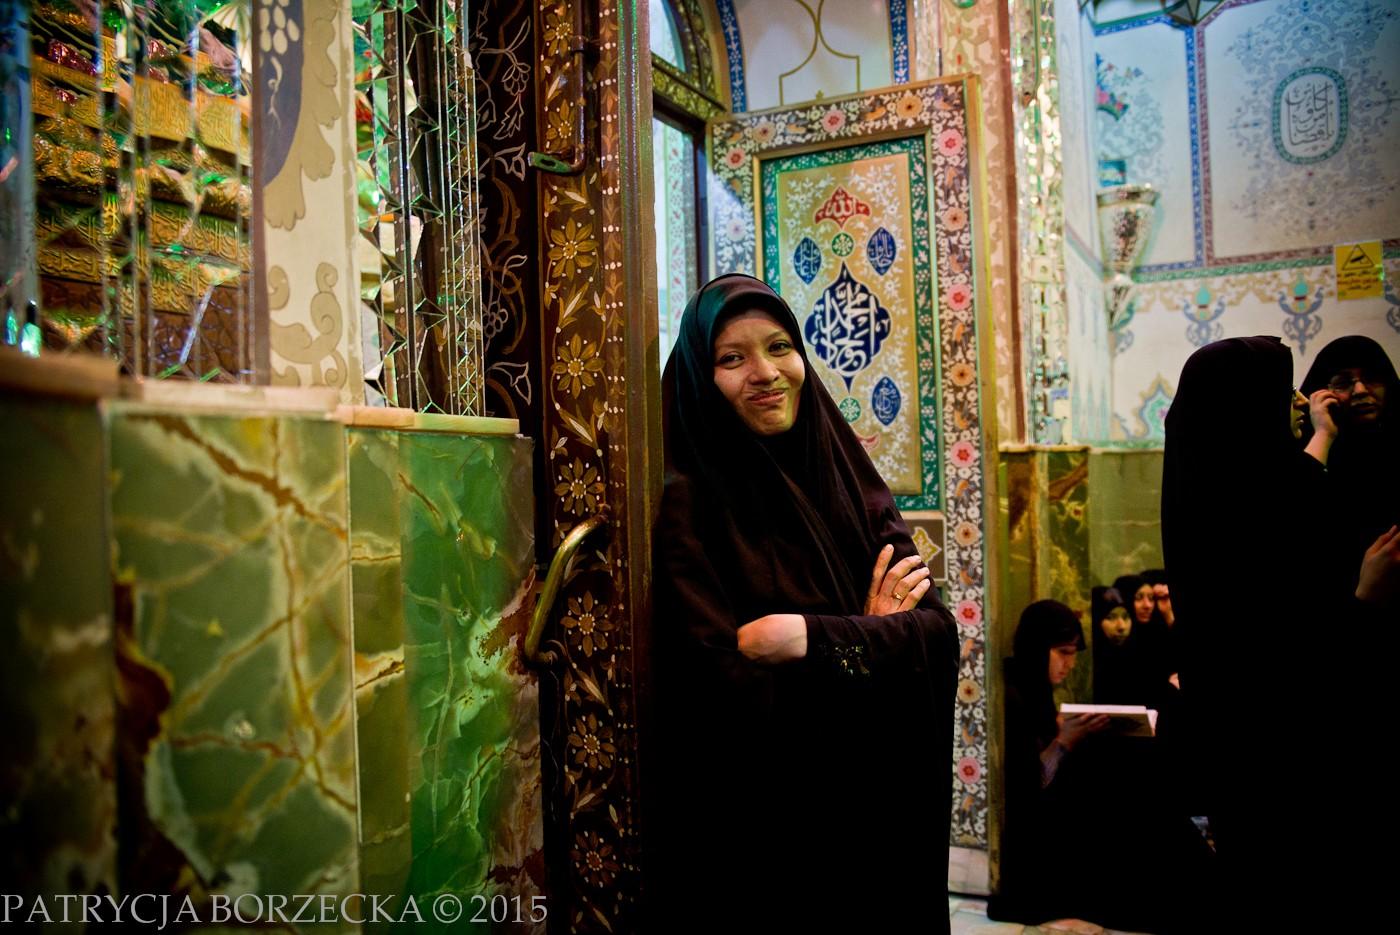 PatrycjaBorzecka-photography-Iran-people10